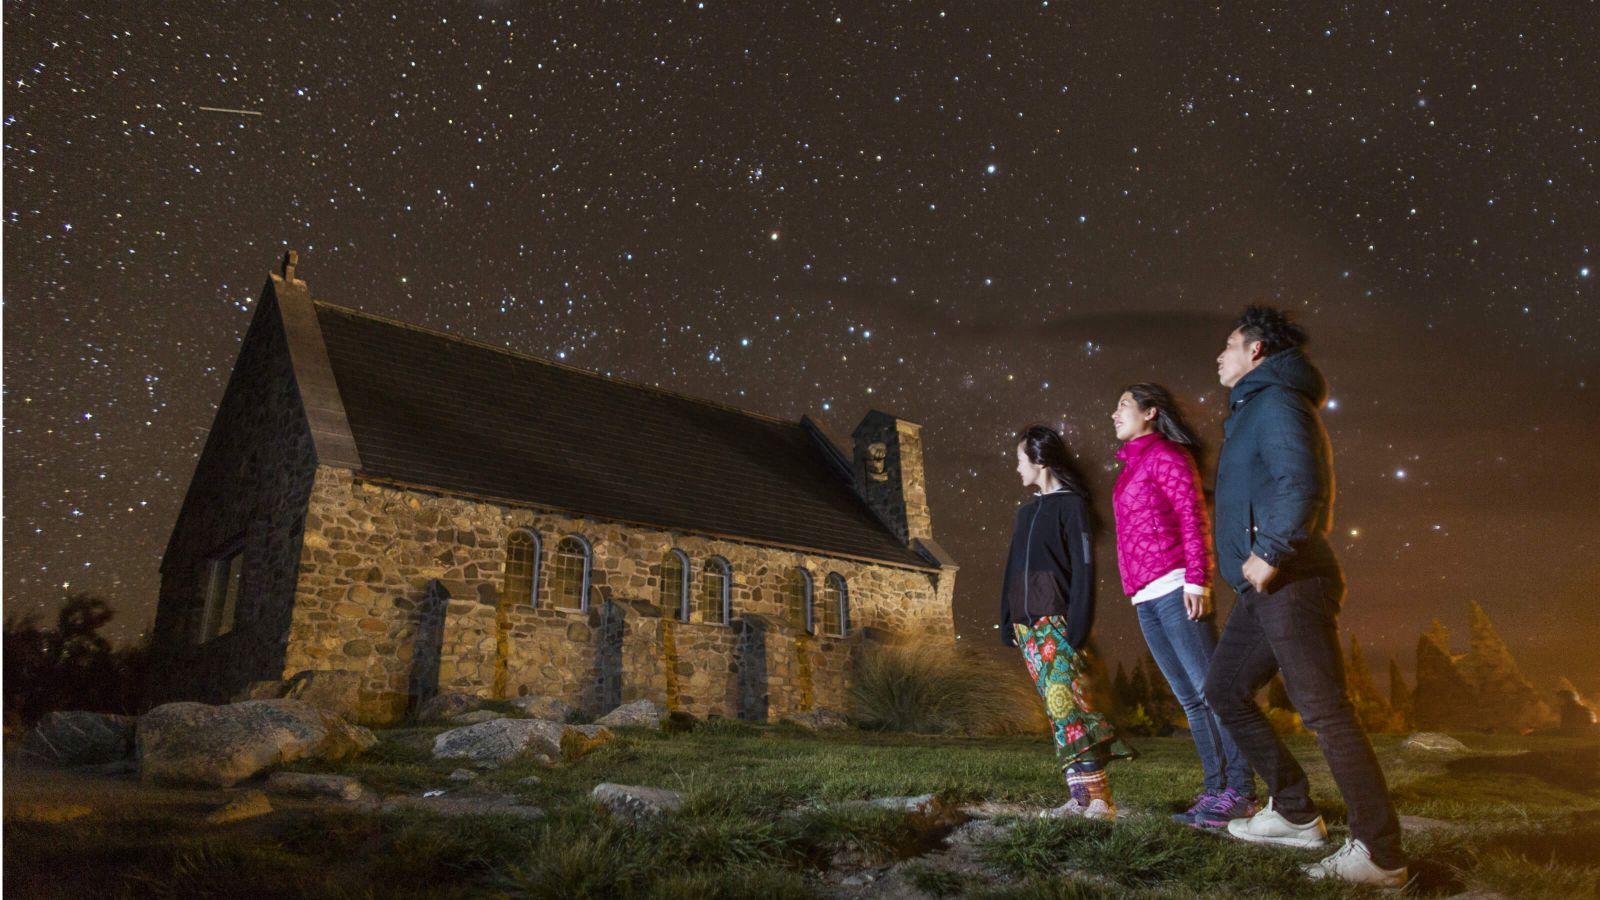 Image of three tourists stargazing at Church of the Good Shepard,Lake Tekapo, Canterbury